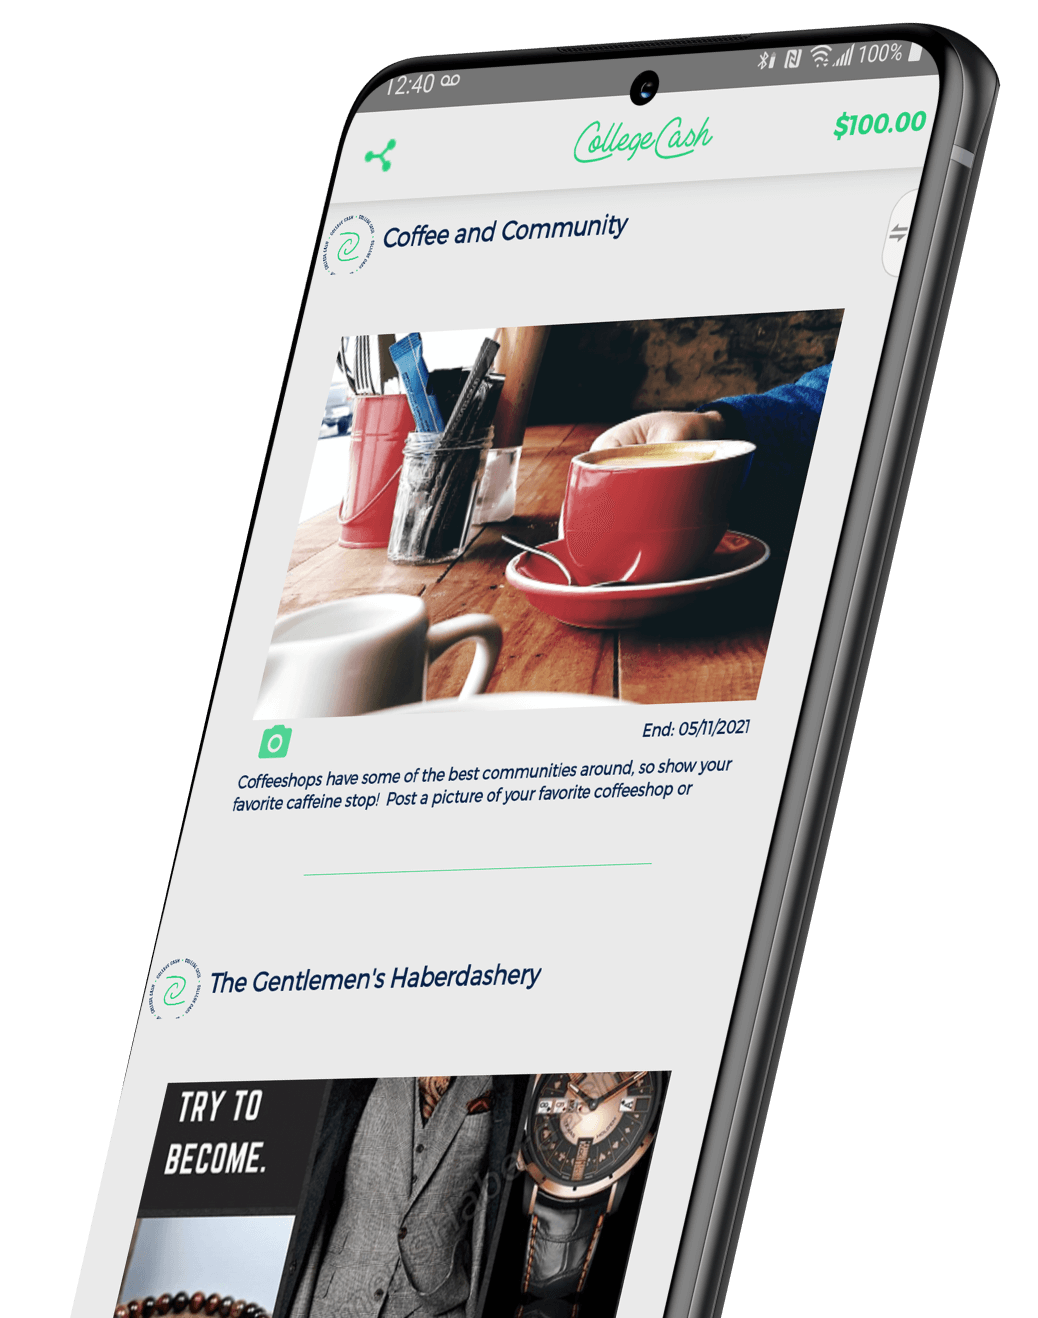 College Cash App Screenshot on a Samsung device.